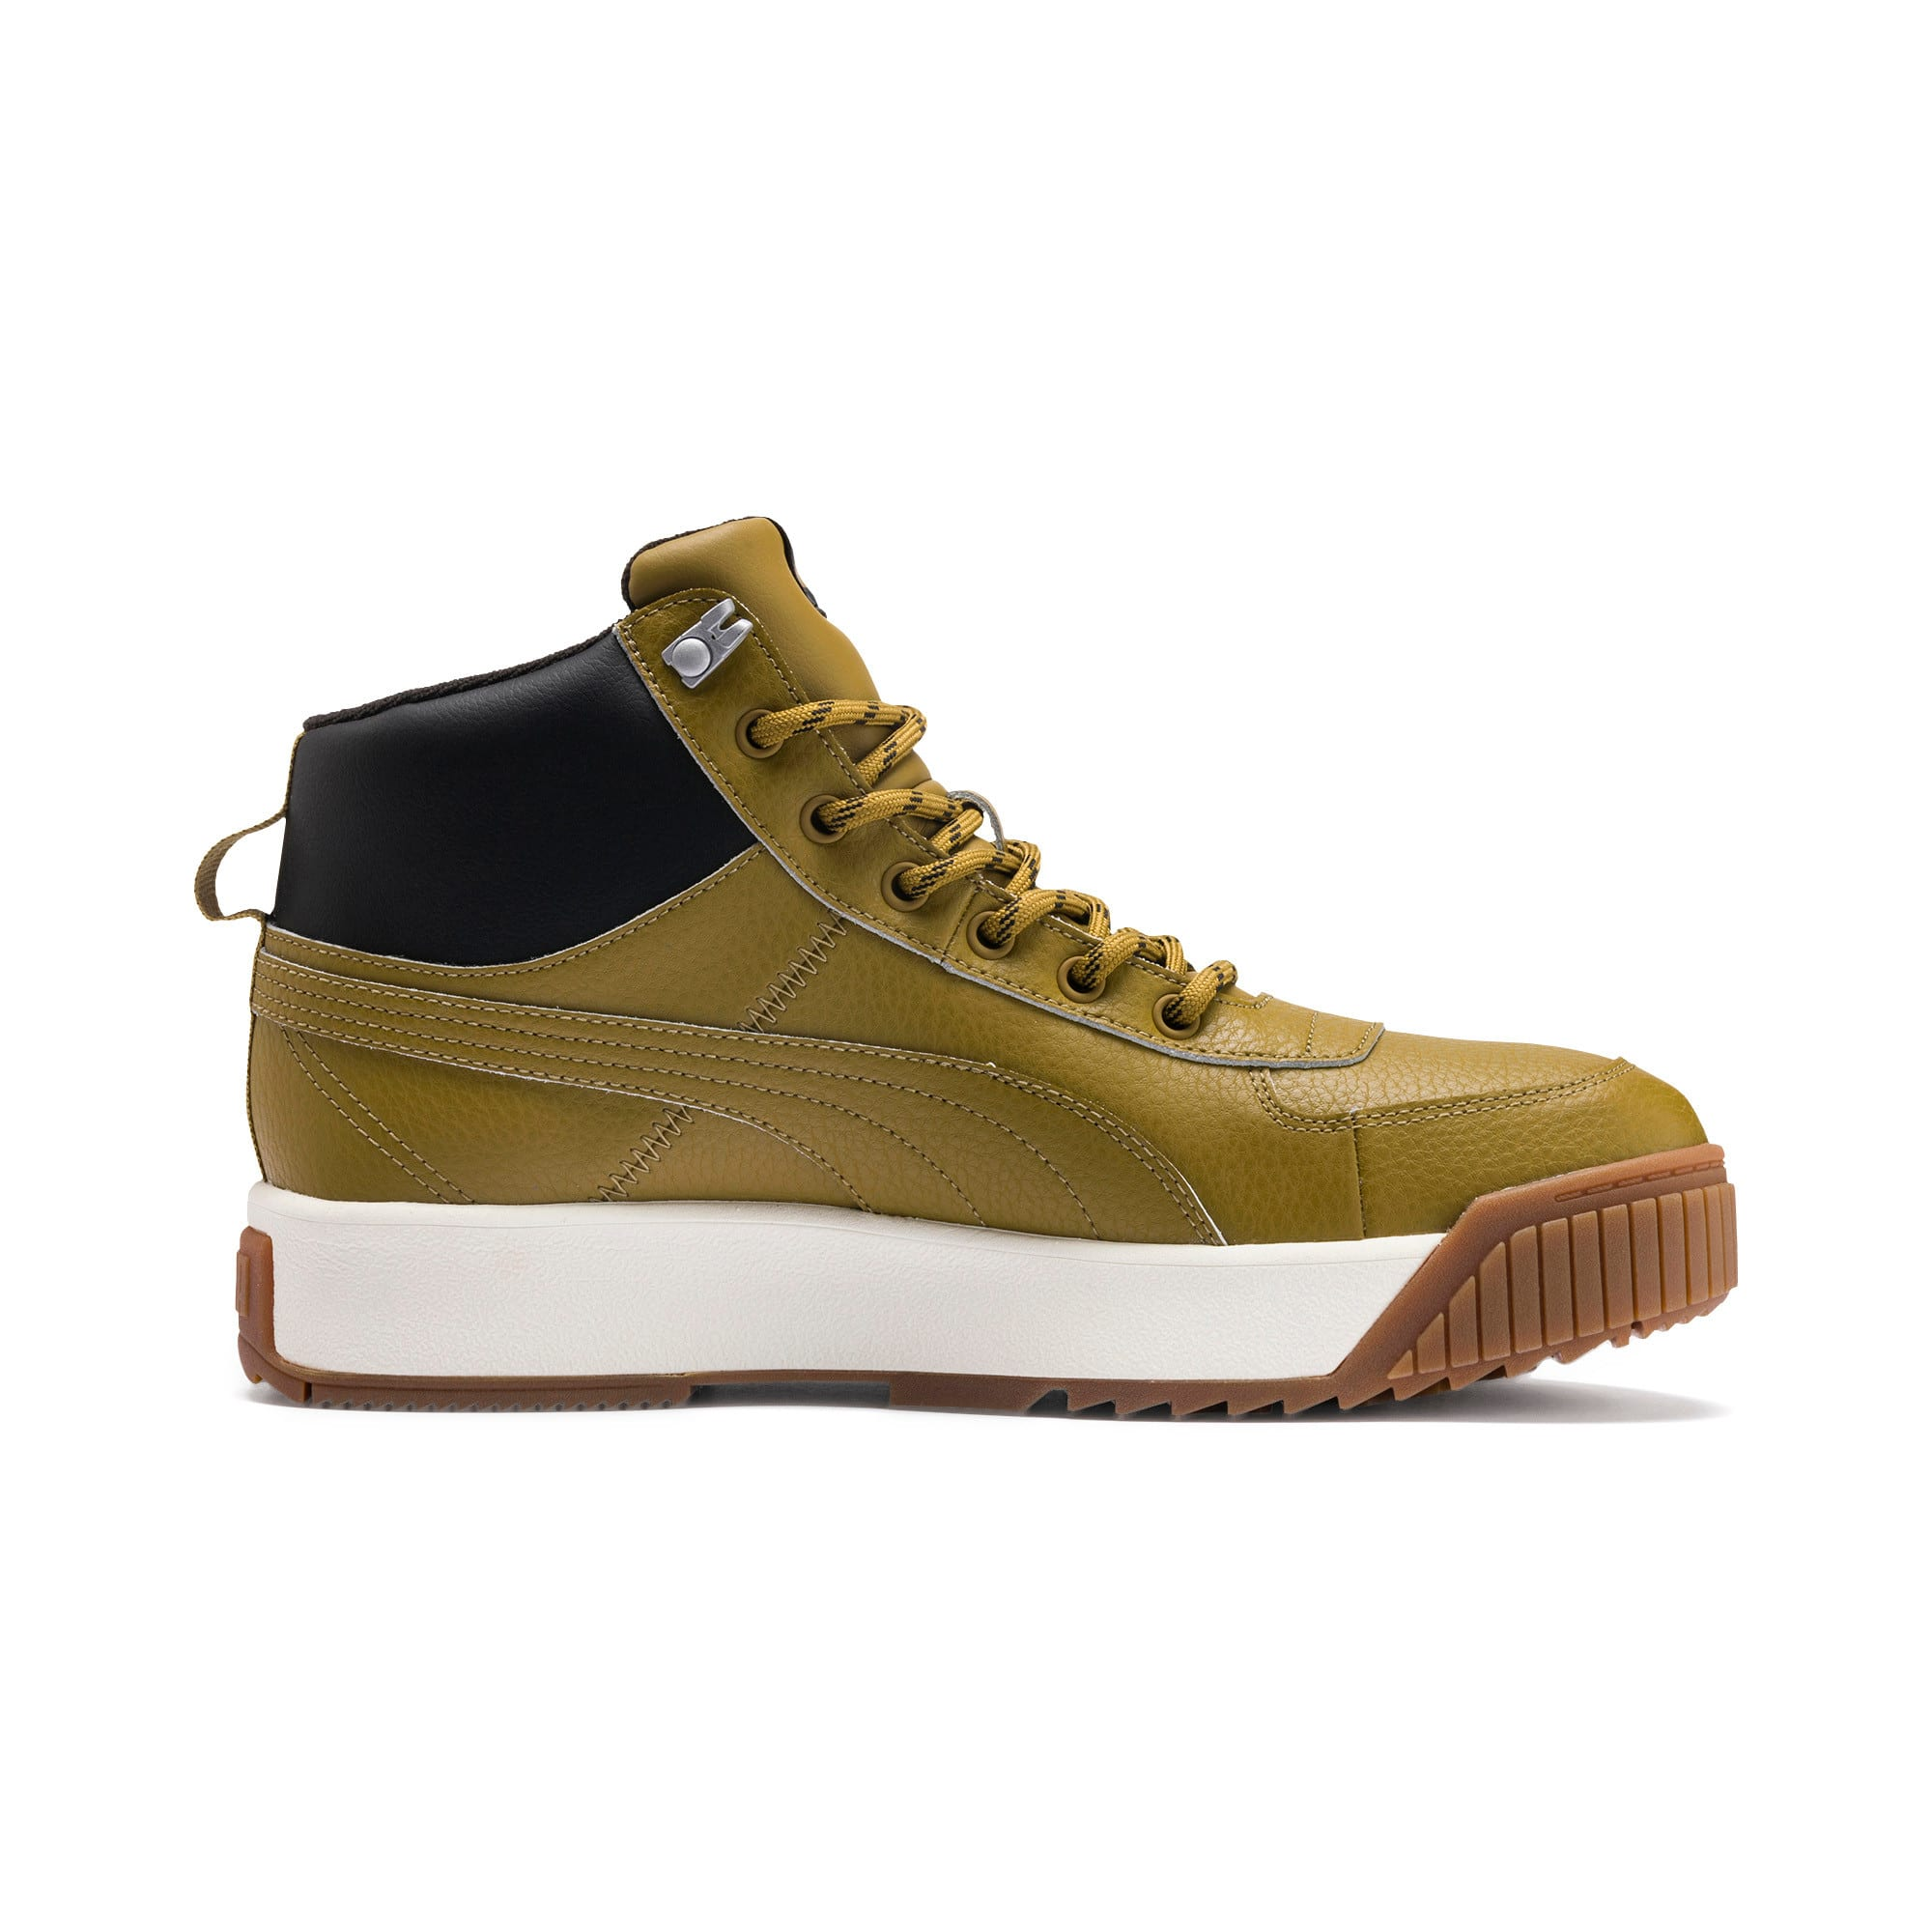 Thumbnail 6 of Tarrenz SB PURETEX Mid Sneakers, Moss Green-Puma Black, medium